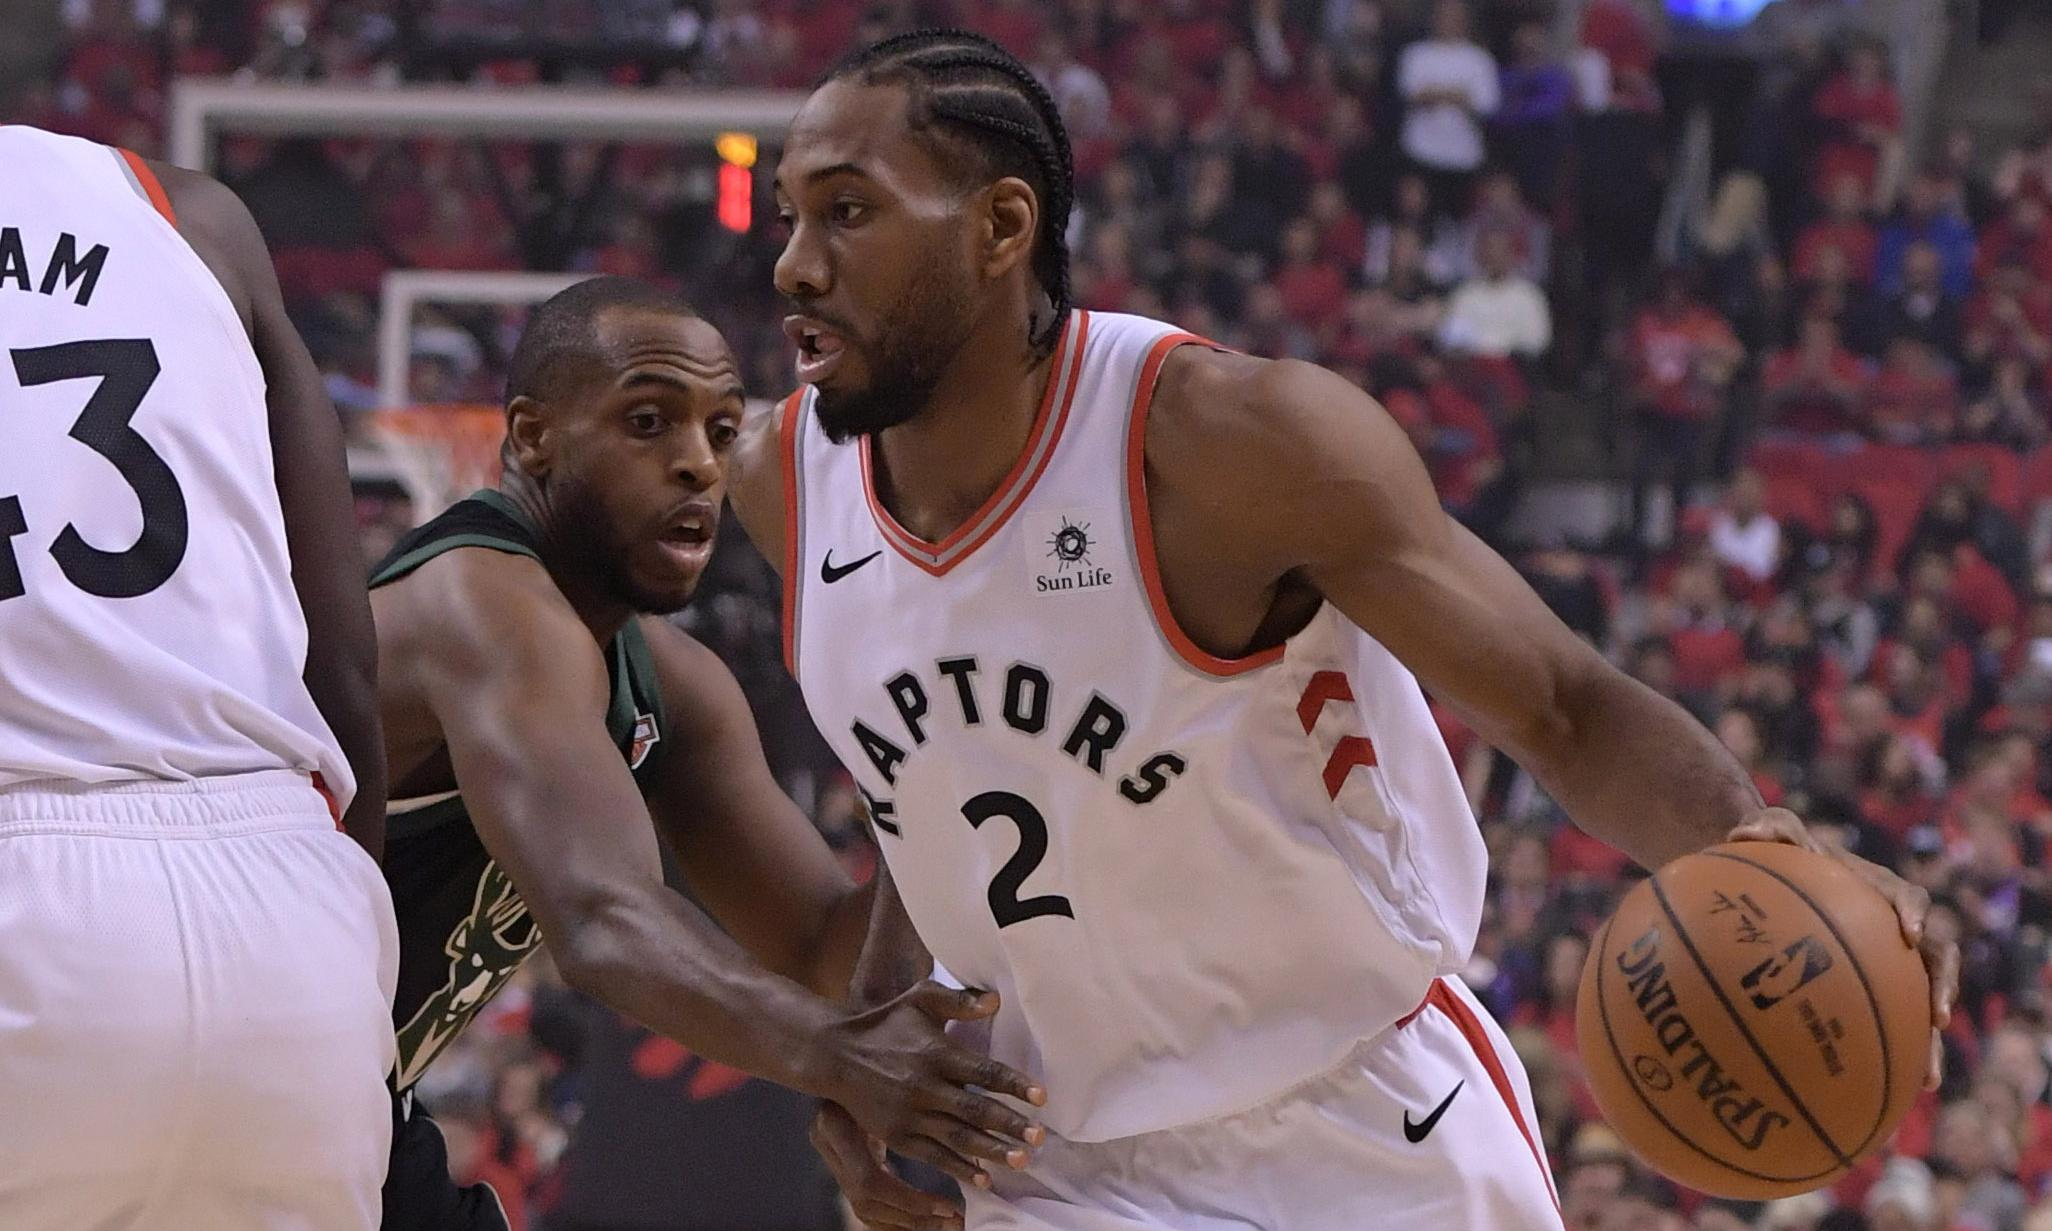 Toronto Raptors finish Milwaukee Bucks to seal first NBA finals berth